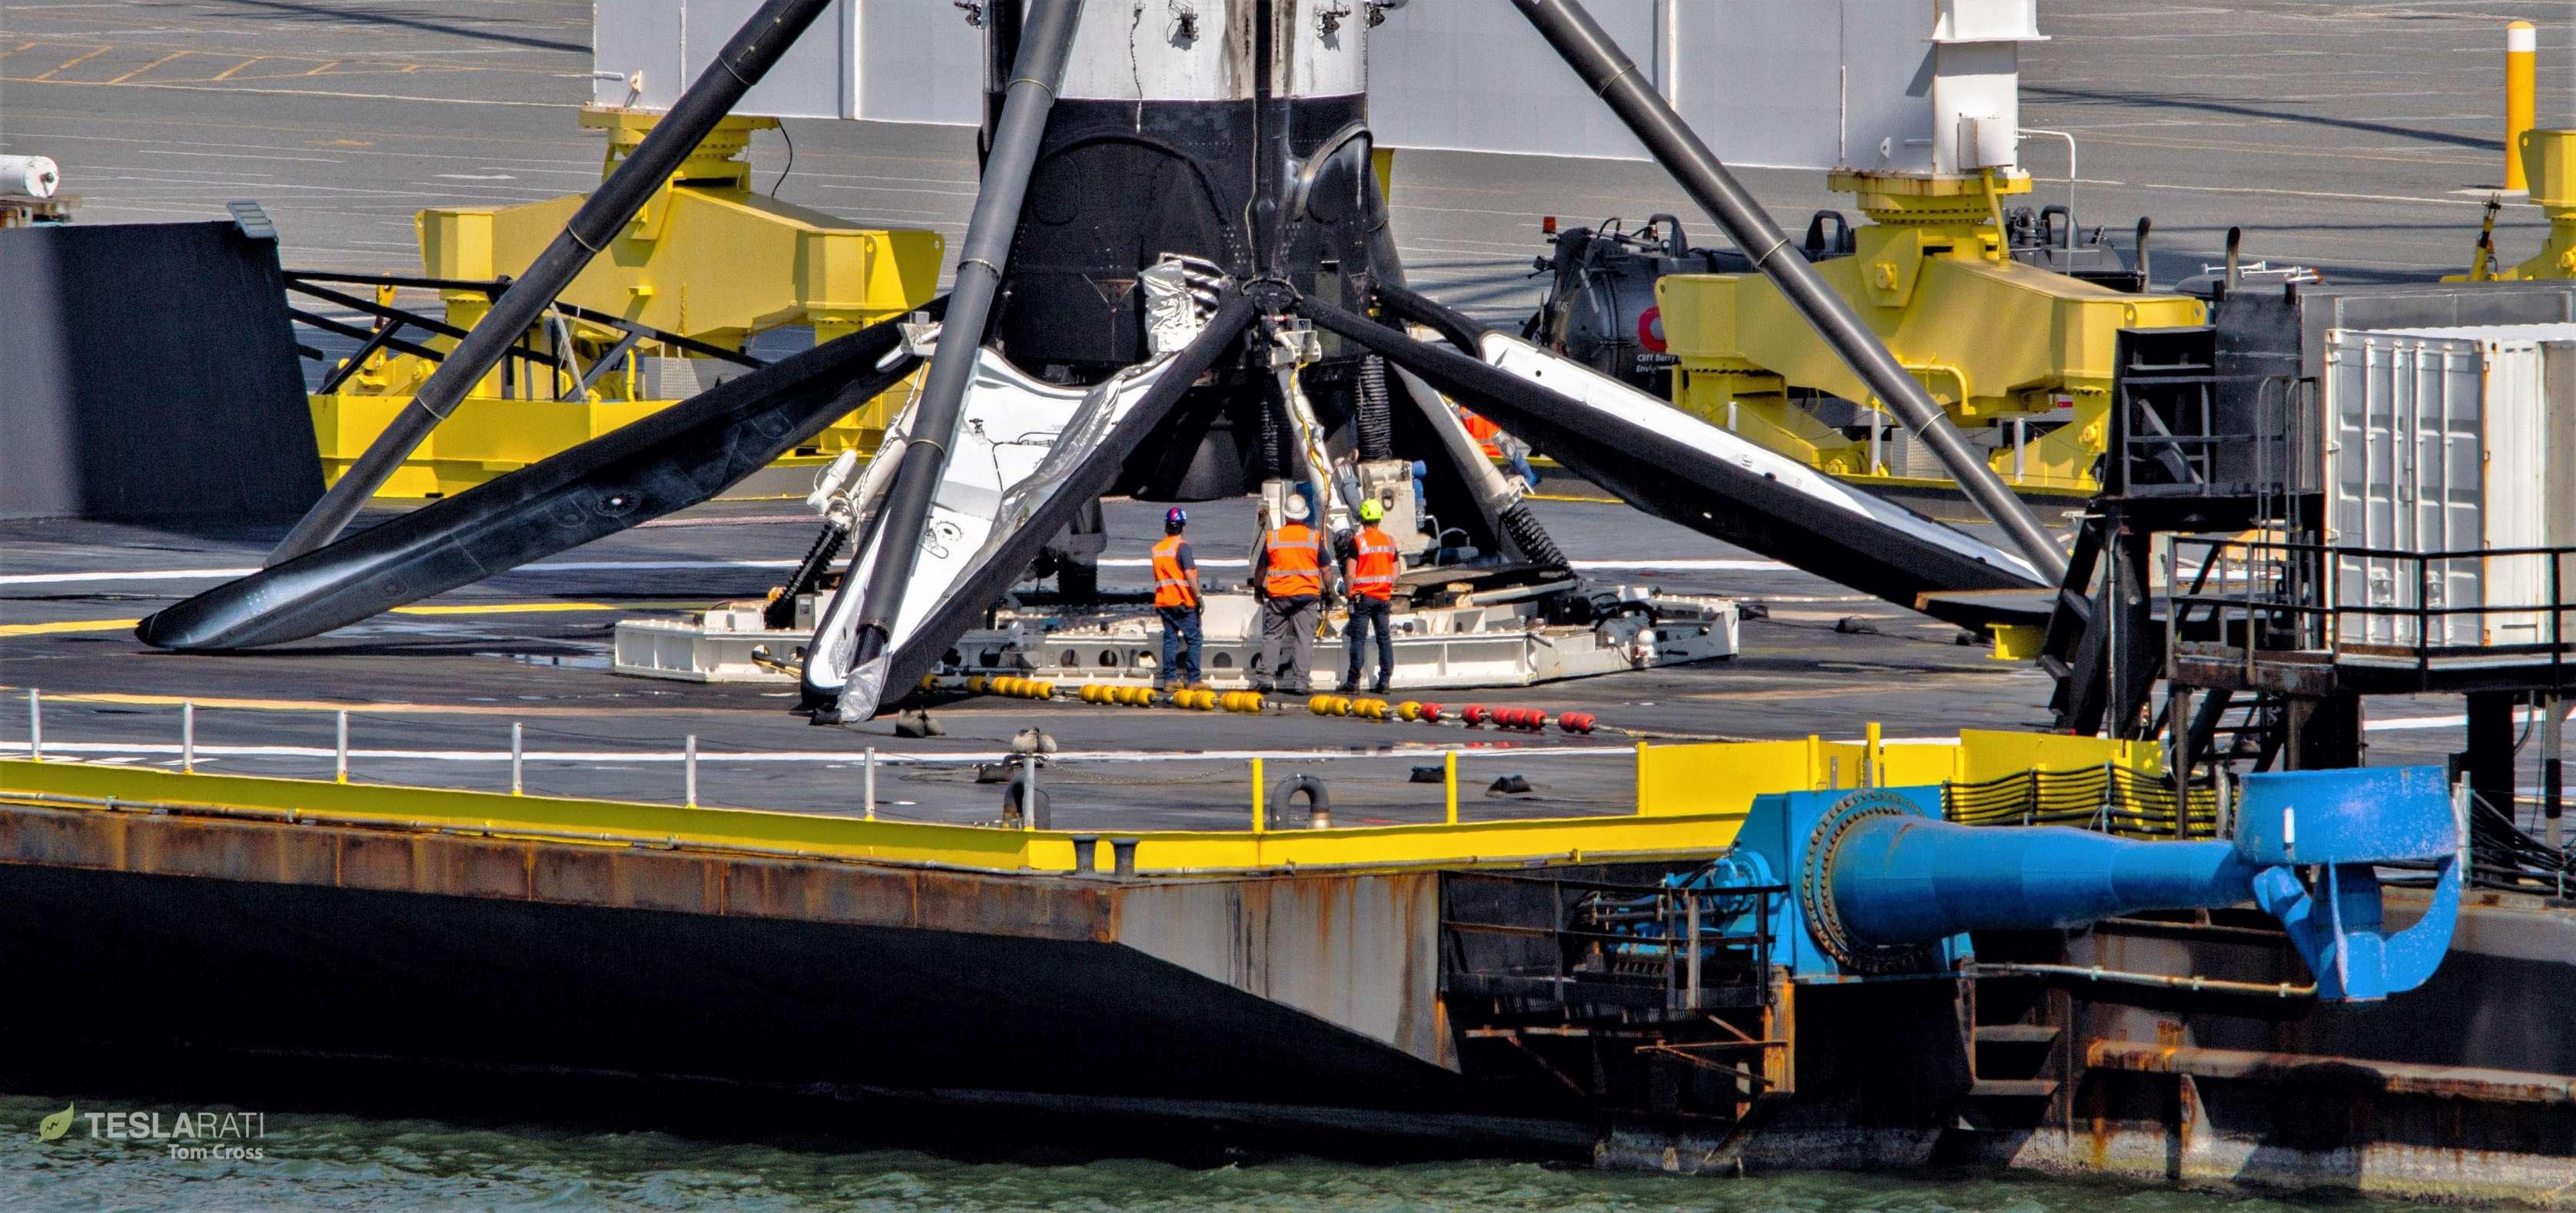 Falcon 9 B1048 PSN-6 OCISLY return 022419 (Tom Cross) 8 crop (c)